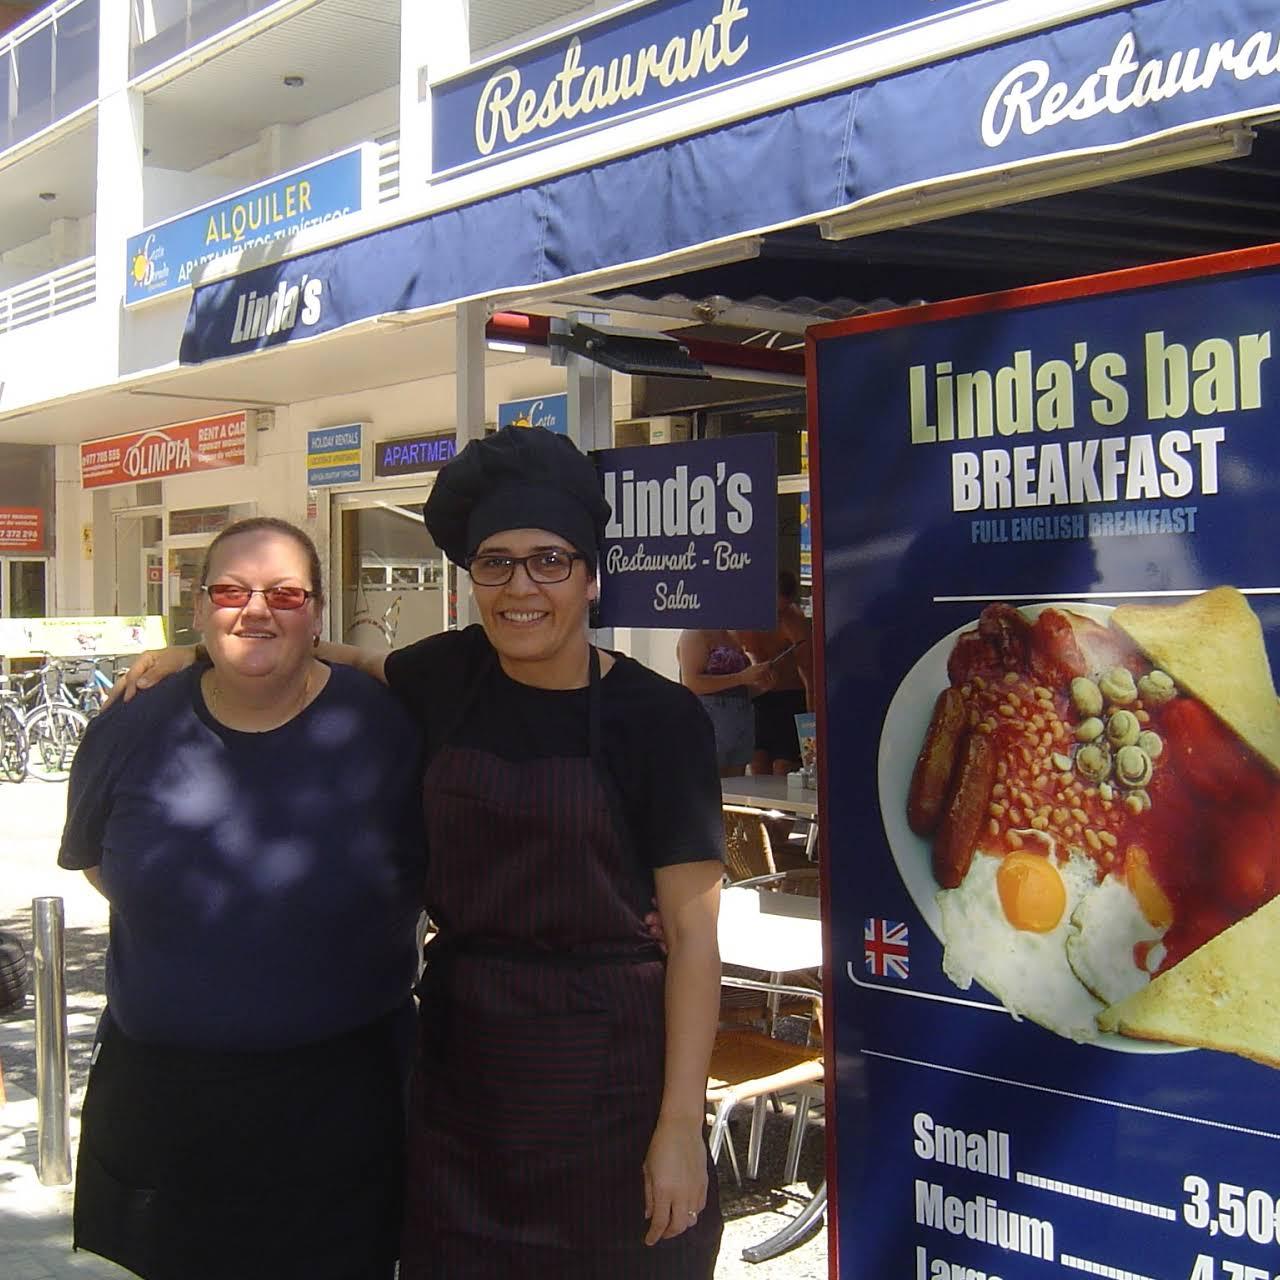 Lindas bar restaurant